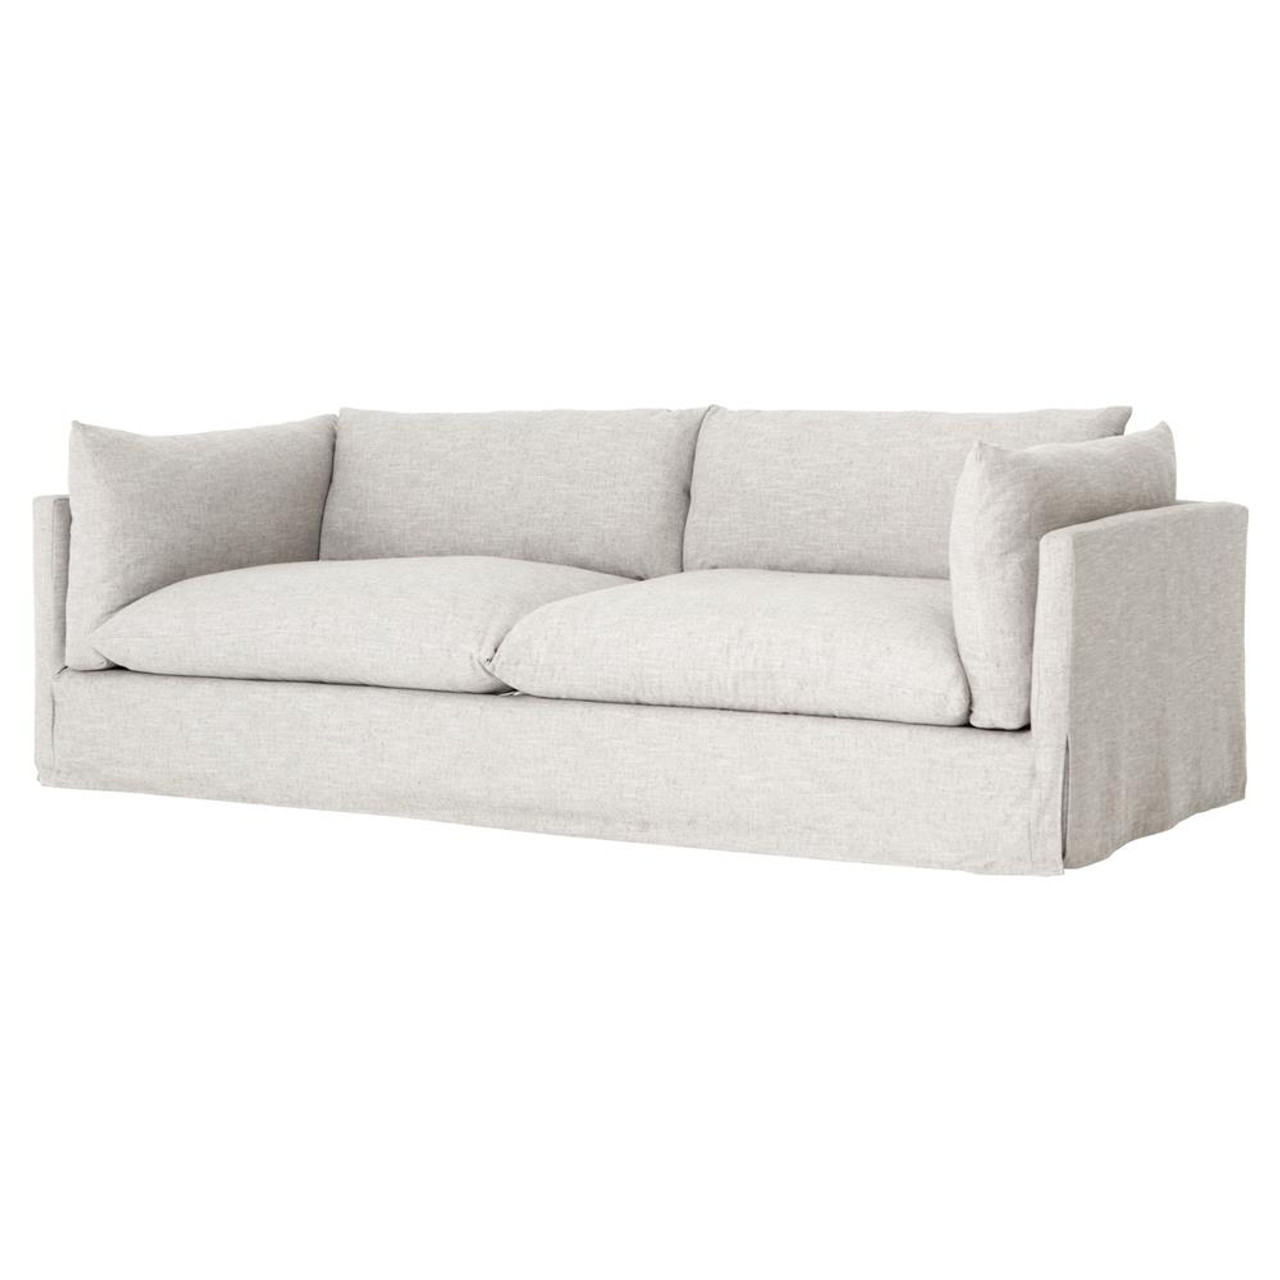 "Loft Modern Beige Slipcovered Lounge Sofa 5"""